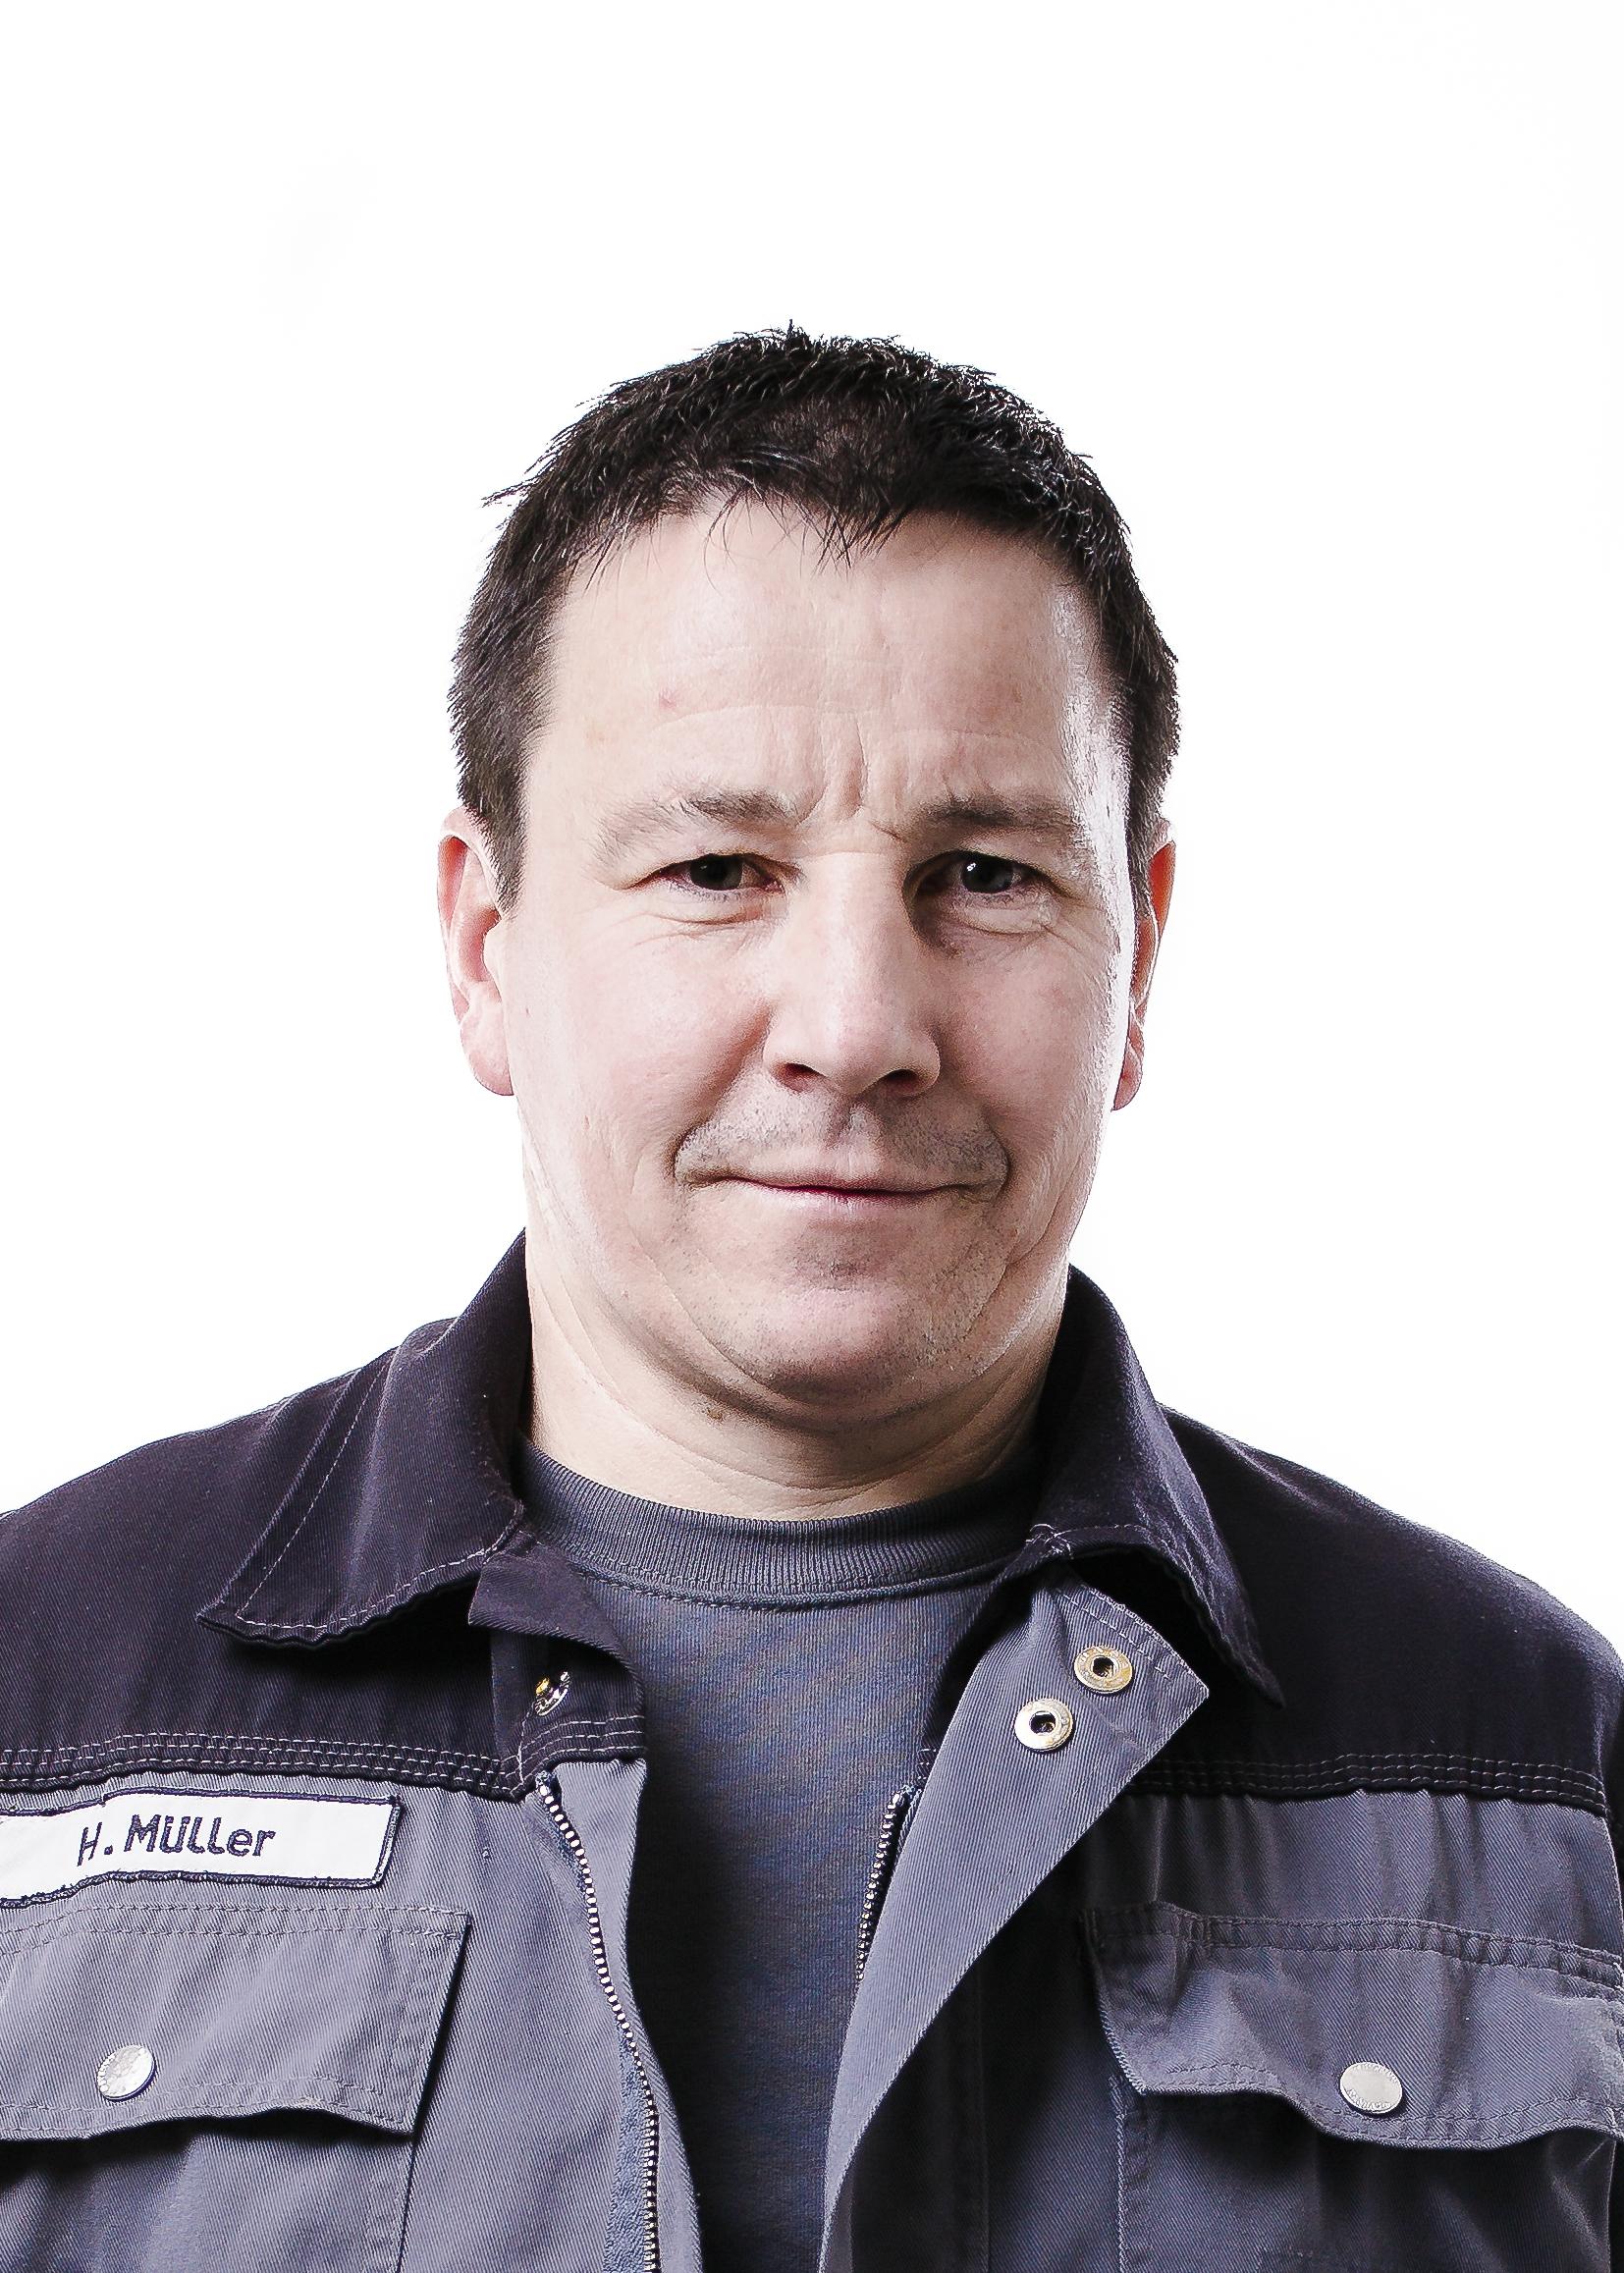 Herbert Müller, Electrician